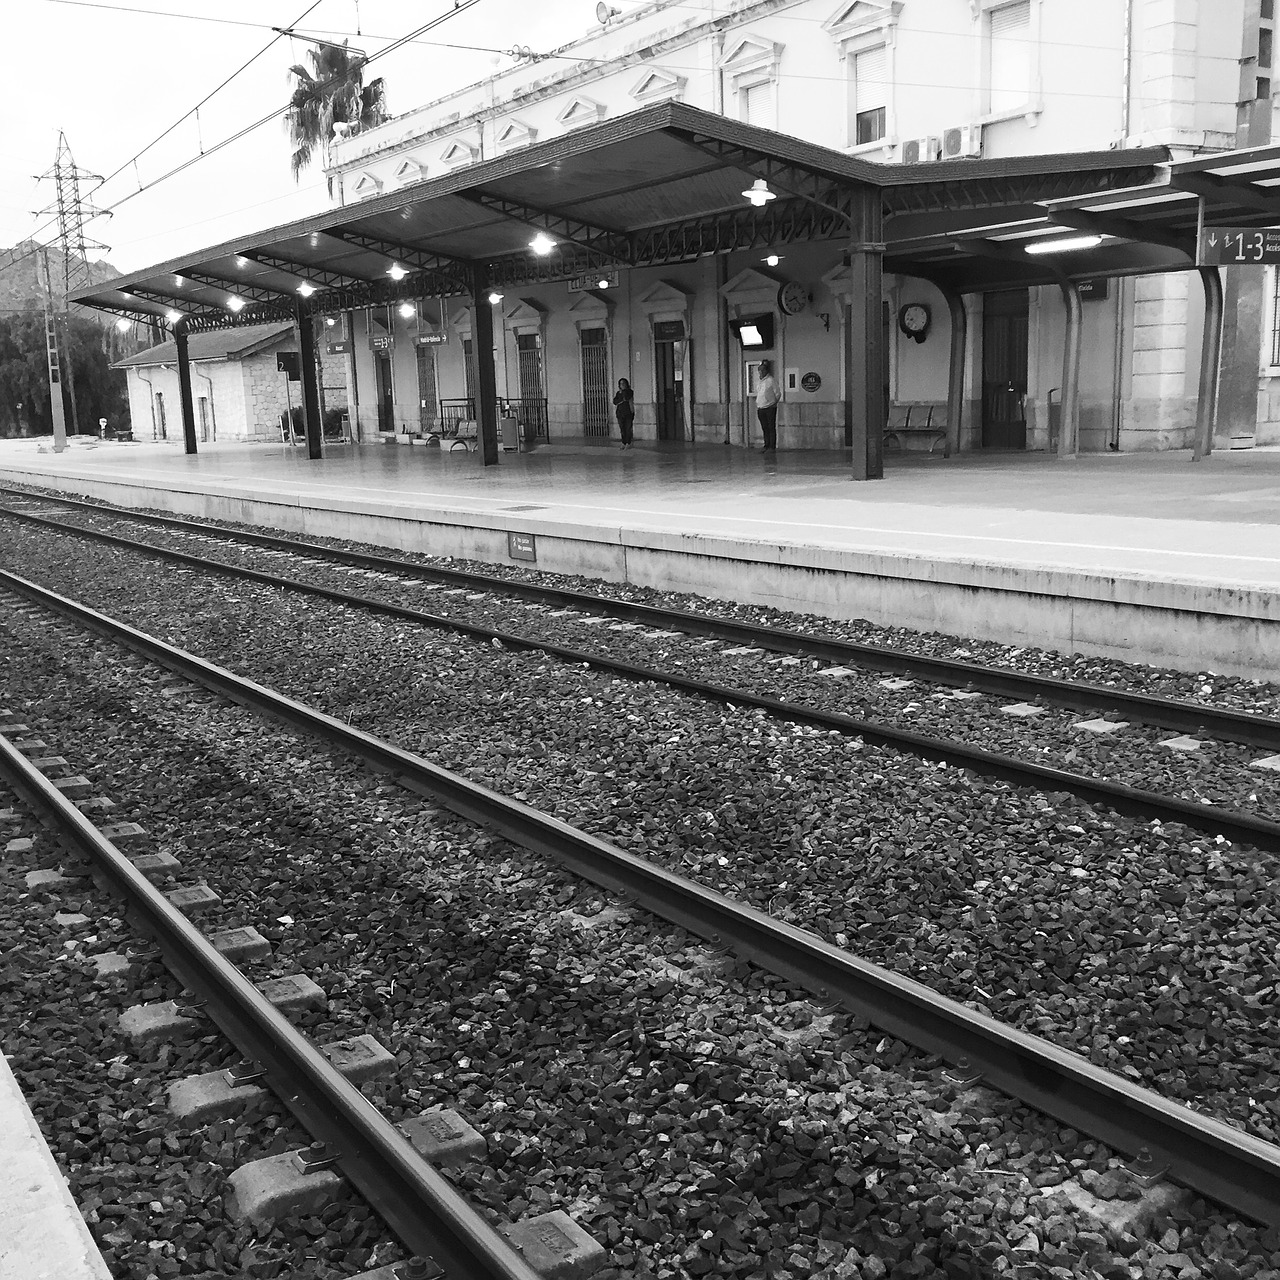 railway-station-1007167_1280